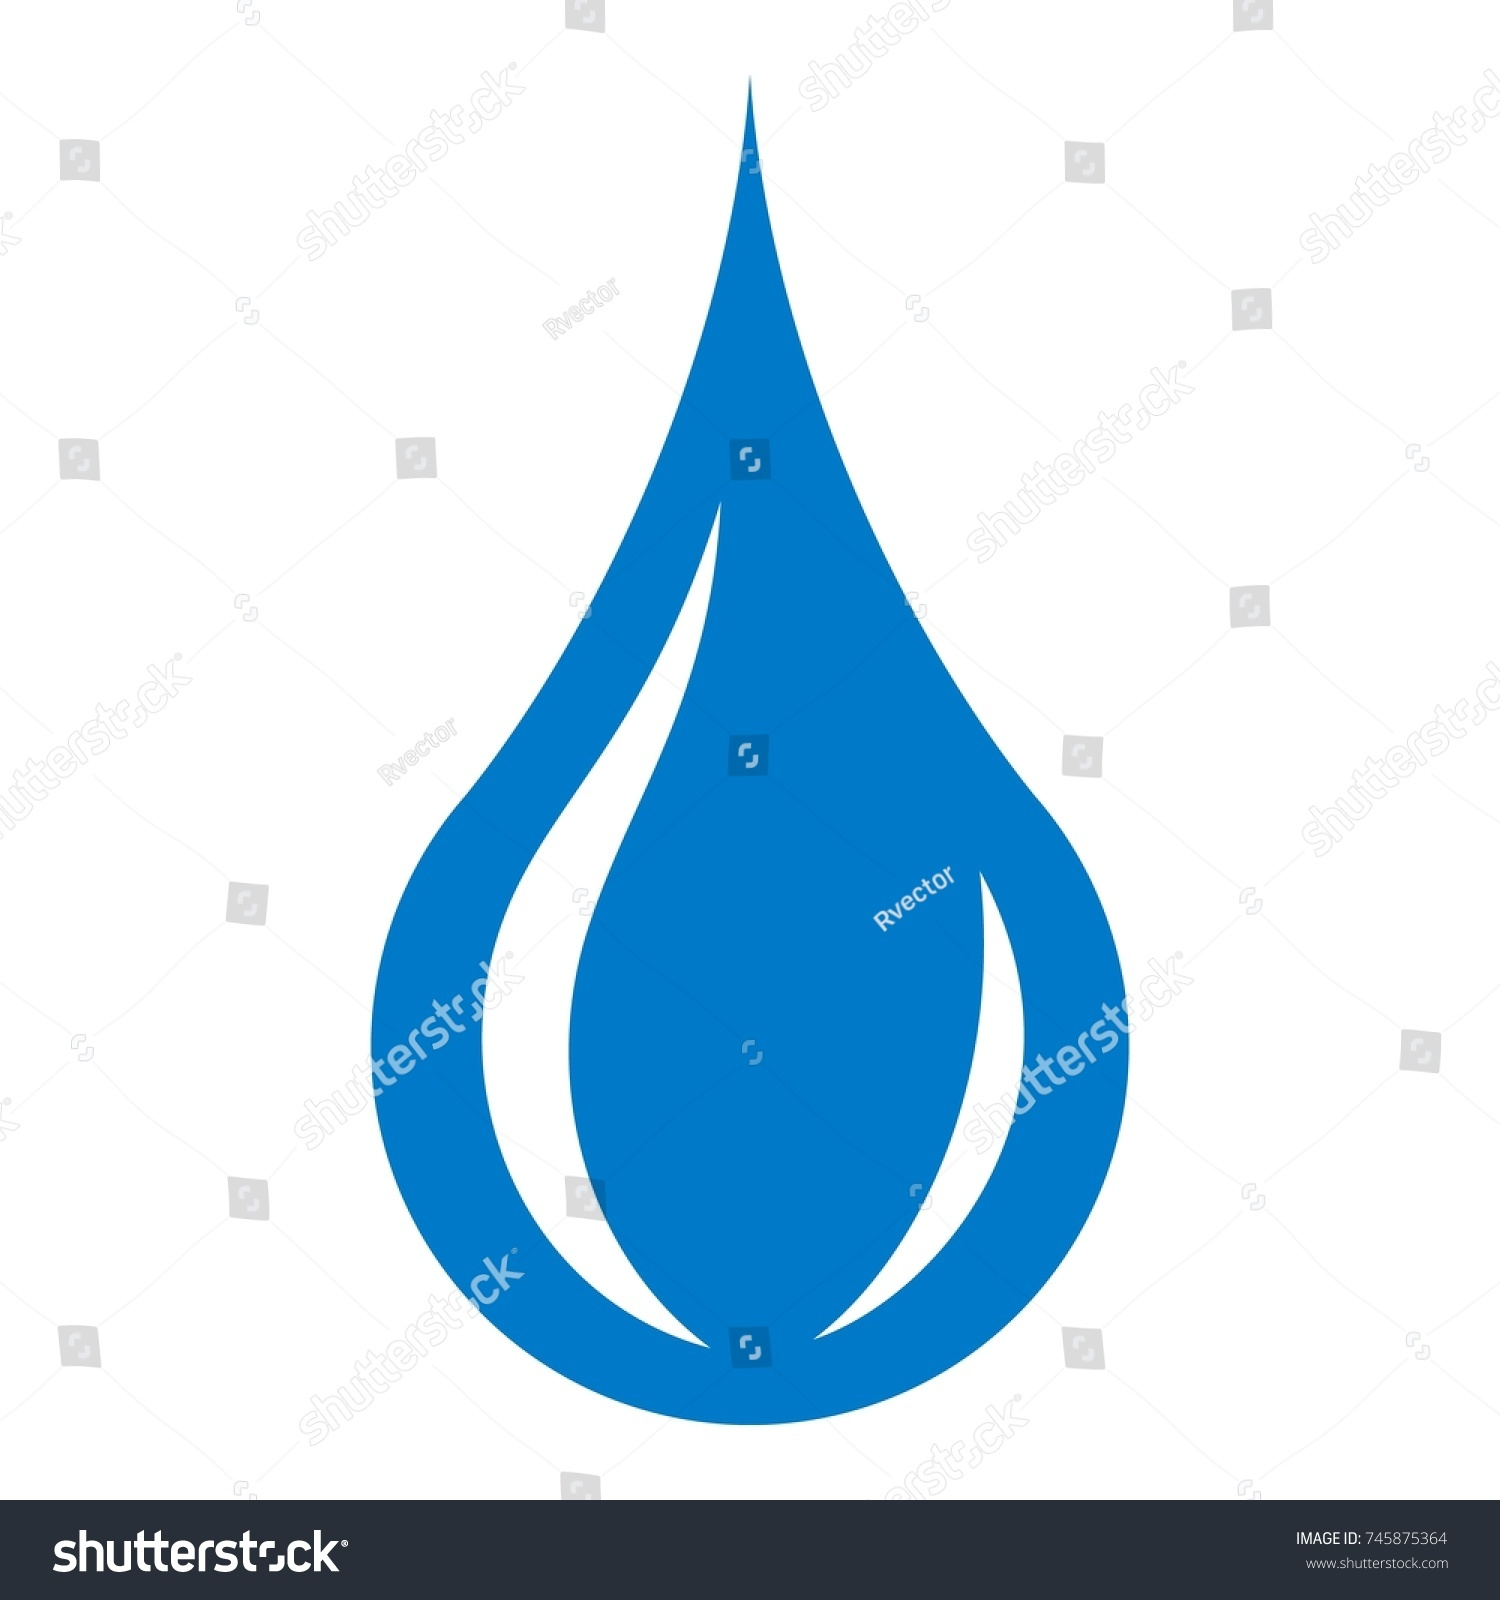 raindrop icon simple illustration raindrop vector stock vector rh shutterstock com raindrop vector graphics raindrop vector image